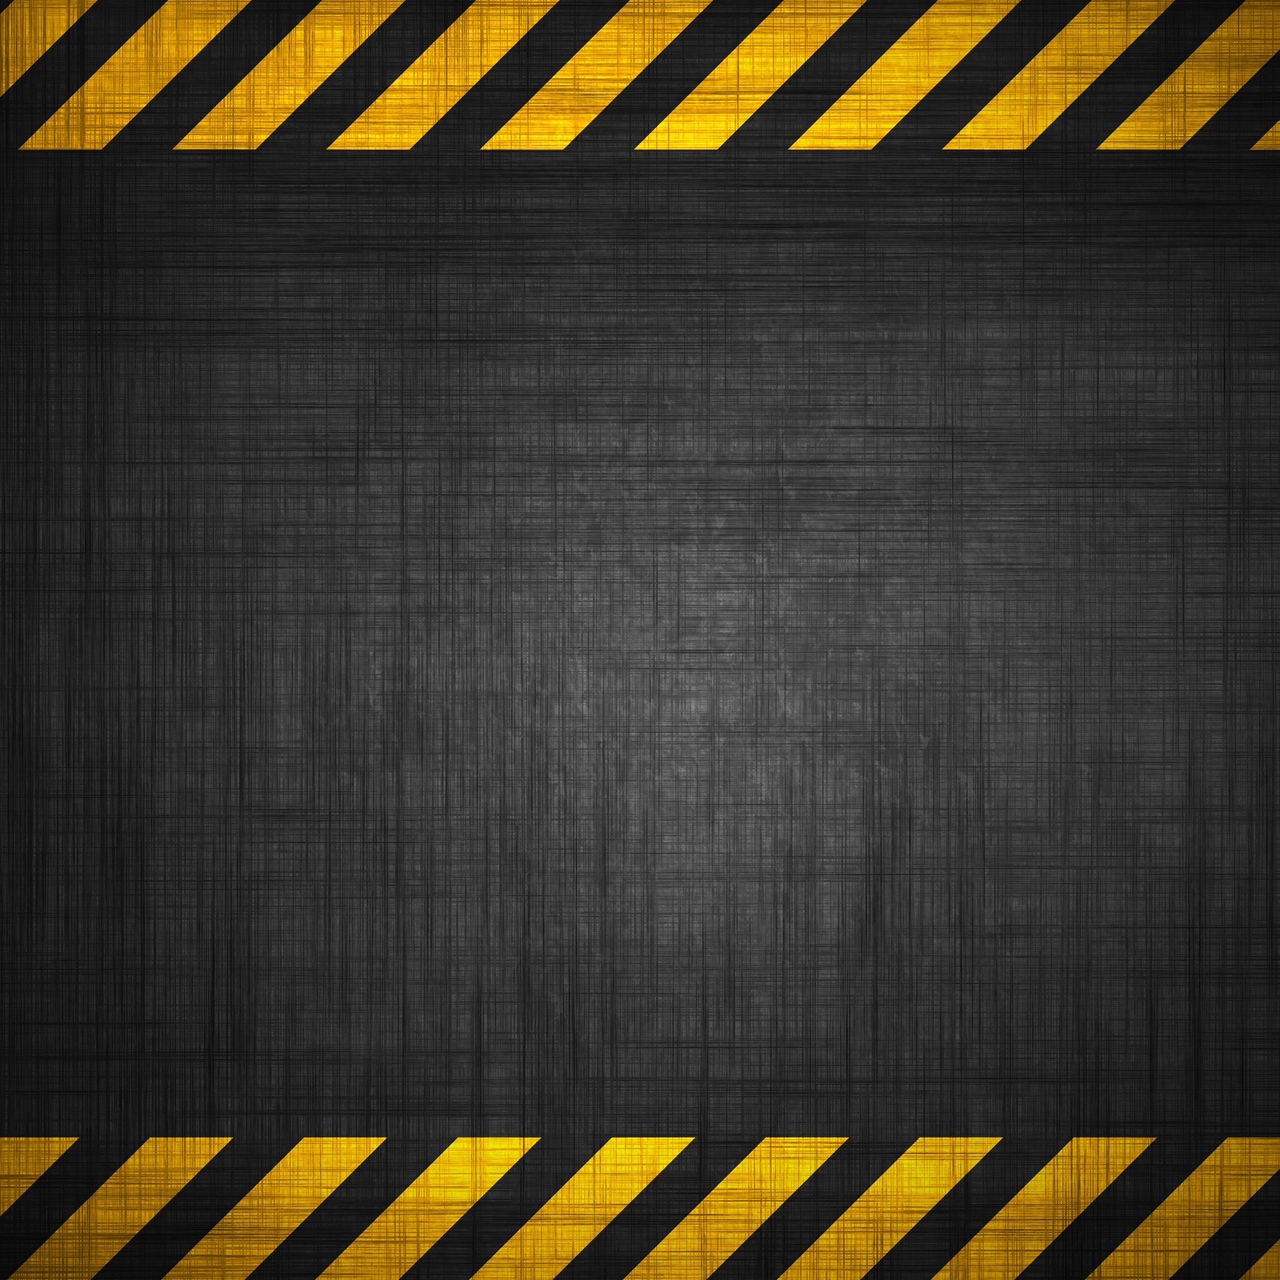 background_tapes_radiation_hazard_wall_18526_1280x1280